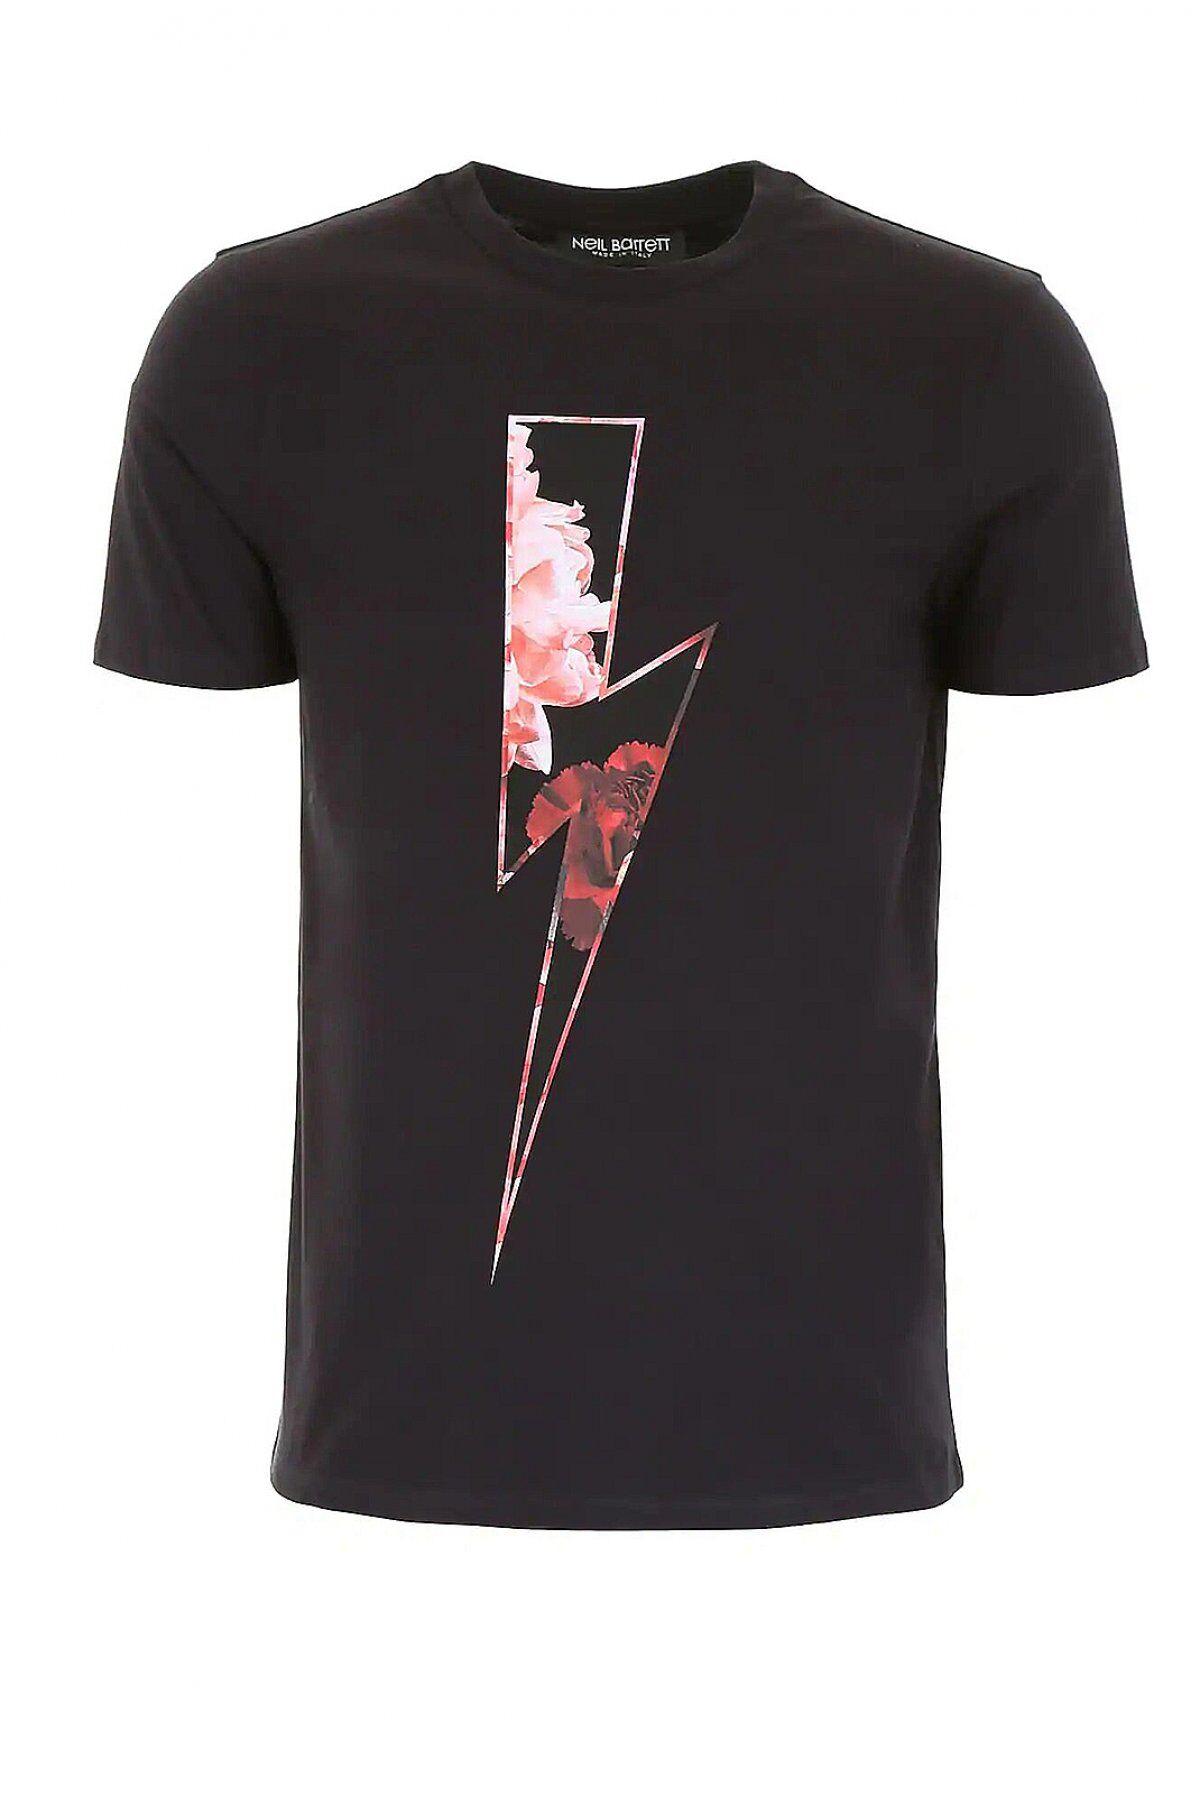 Neil Barrett Tee Shirt Stretch Avec Motif   -  Neil Barrett